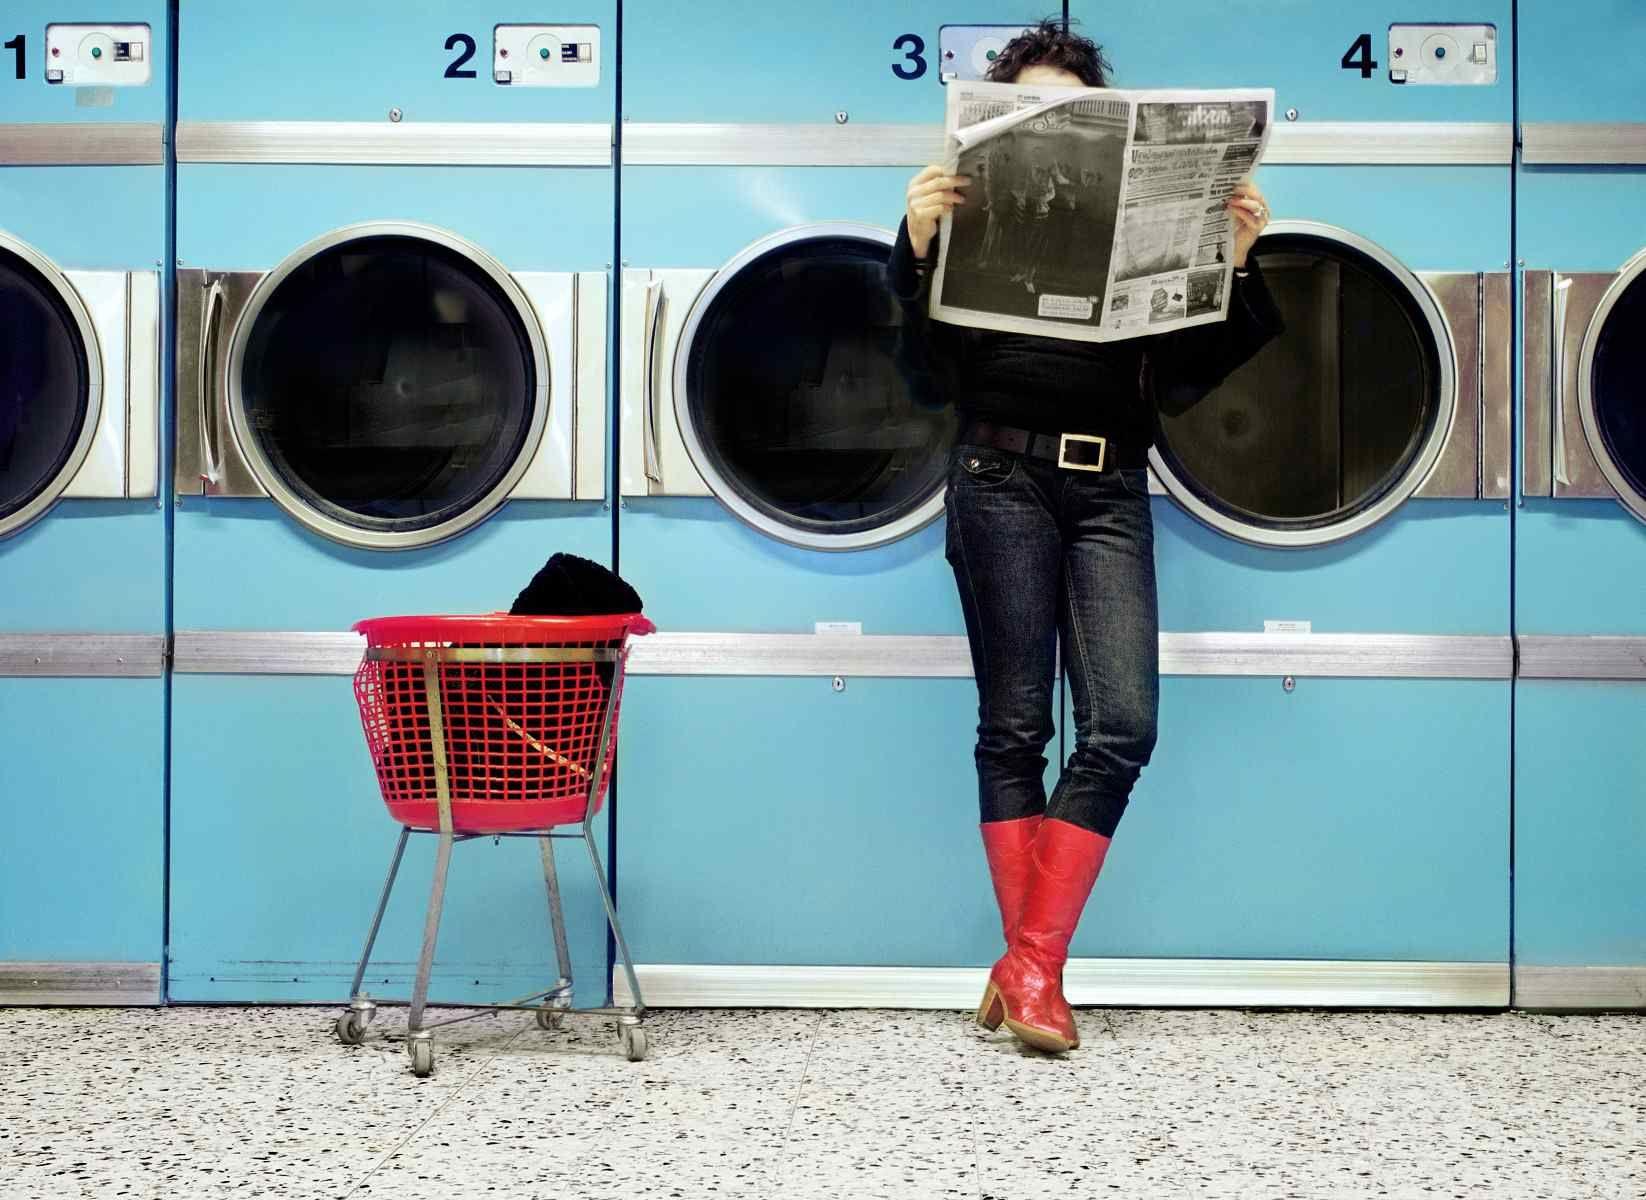 6 Tips For Easier Laundromat Trips Laundry Shop Laundromat Clothes Washing Machine